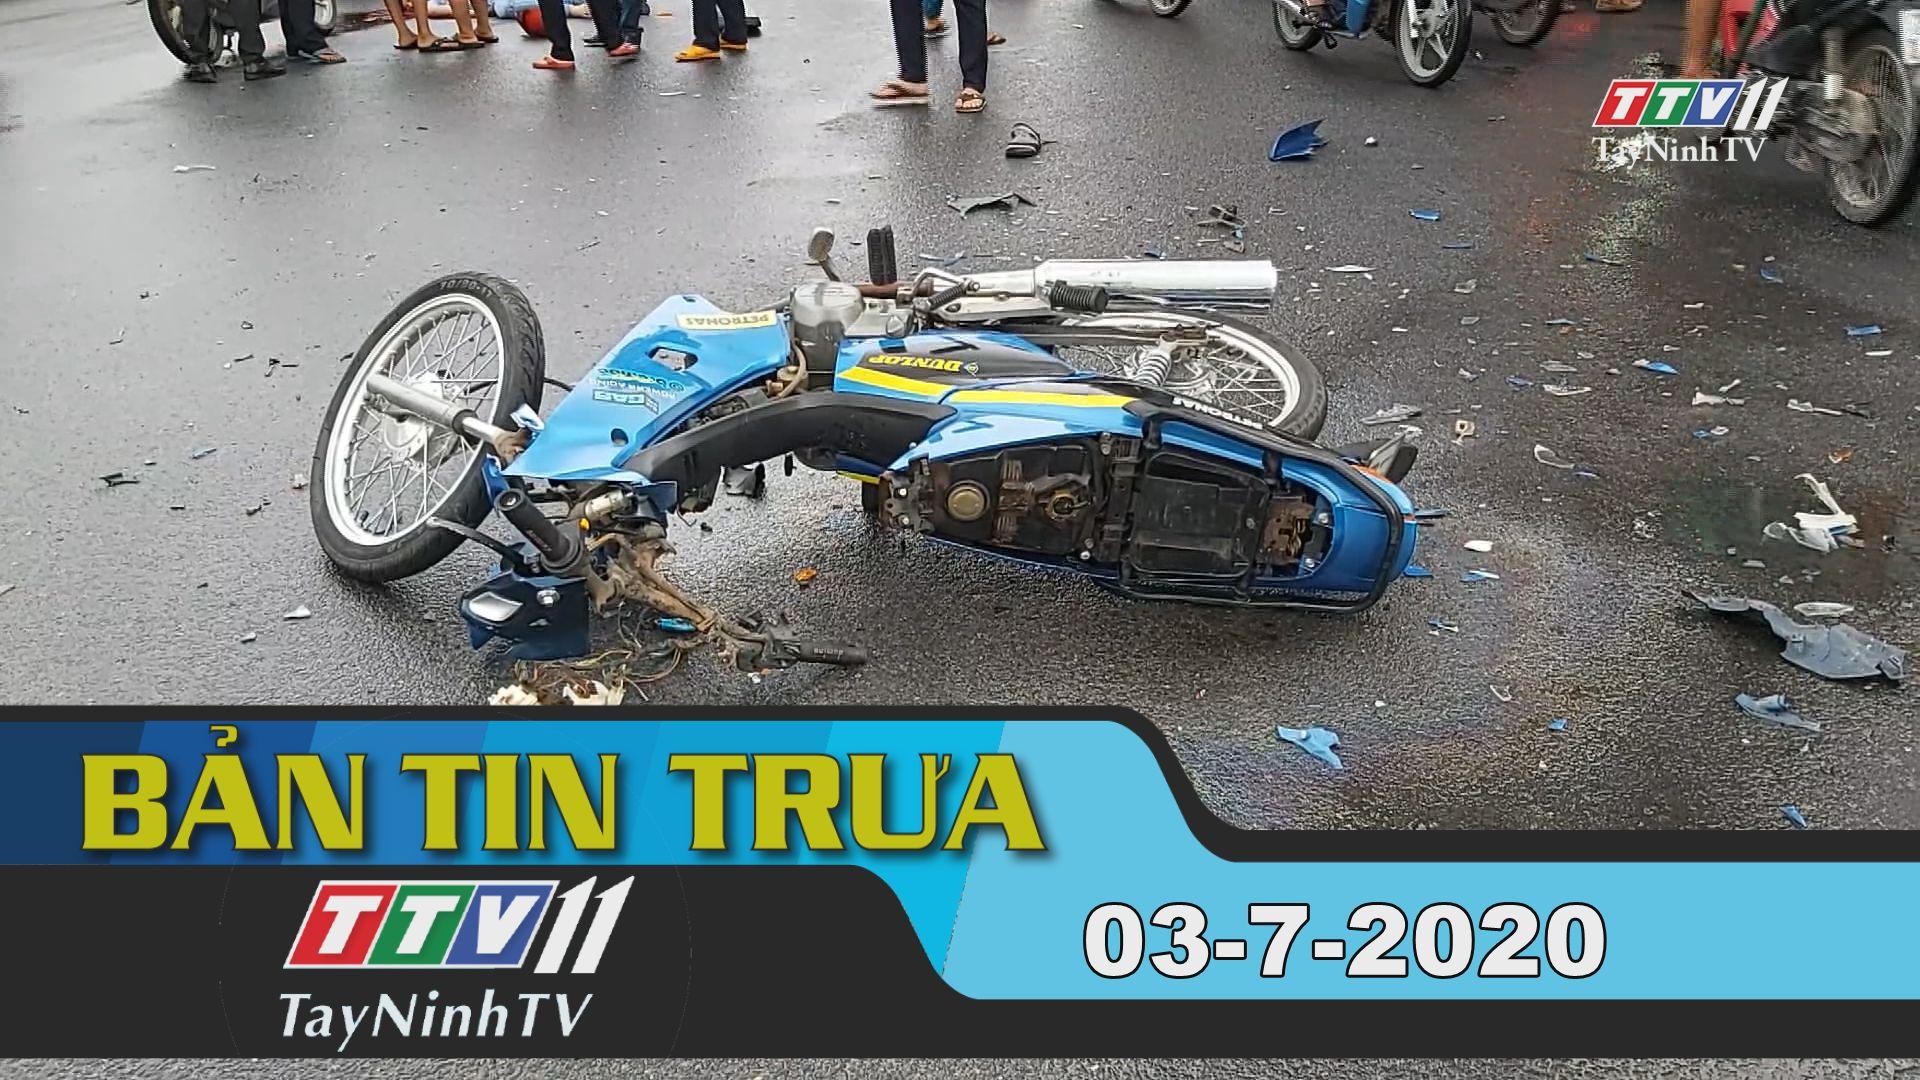 Bản tin trưa 03-7-2020 | Tin tức hôm nay | TayNinhTV